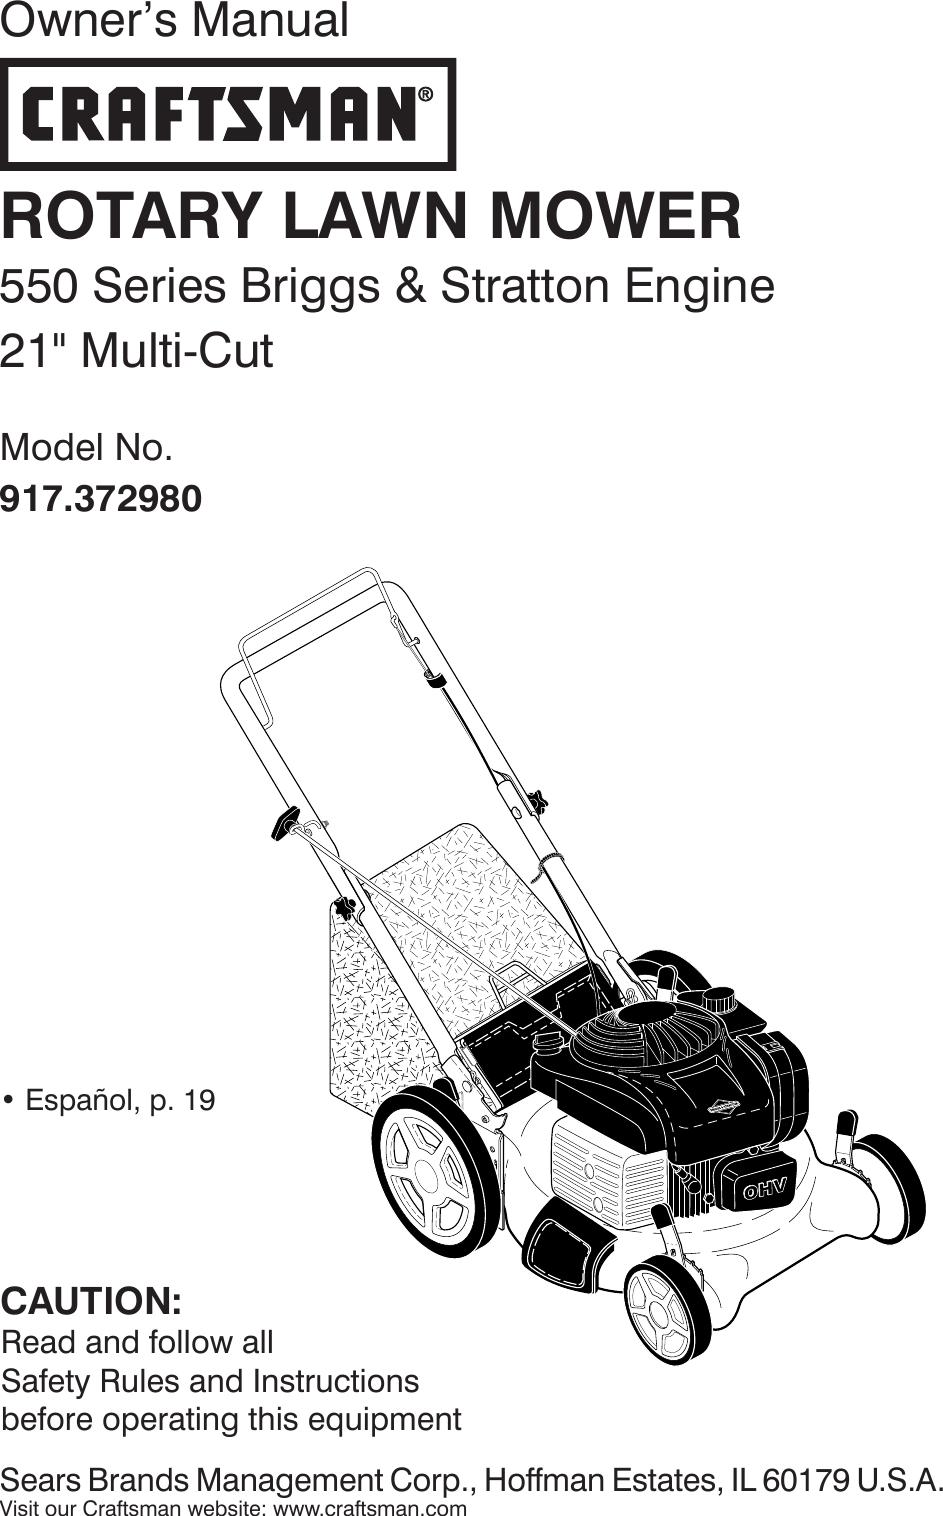 Craftsman 917372980 372980 es 115870396_r0 User Manual